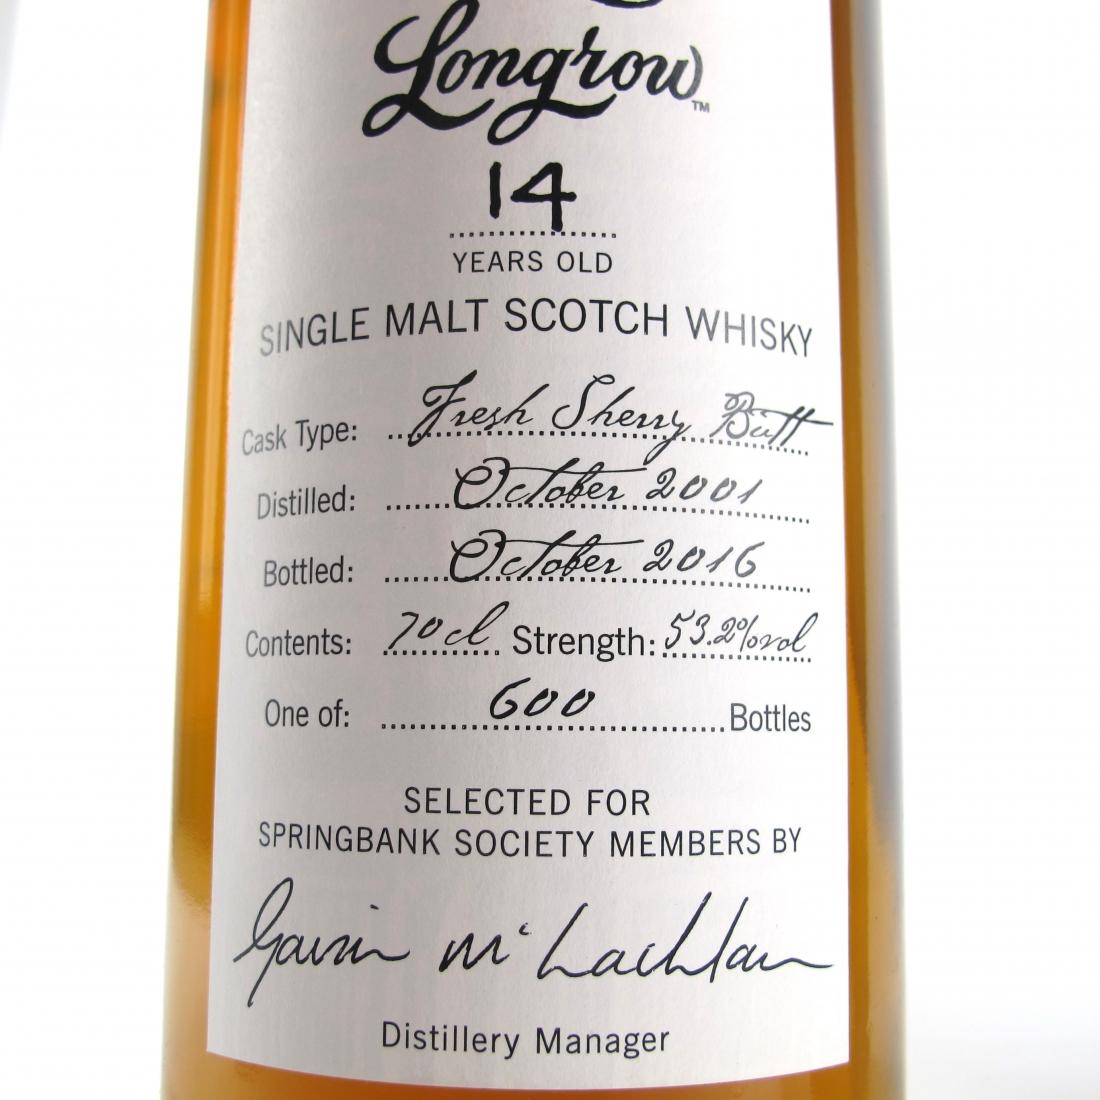 Longrow 2001 Springbank Society 14 Year Old / Fresh Sherry Butt